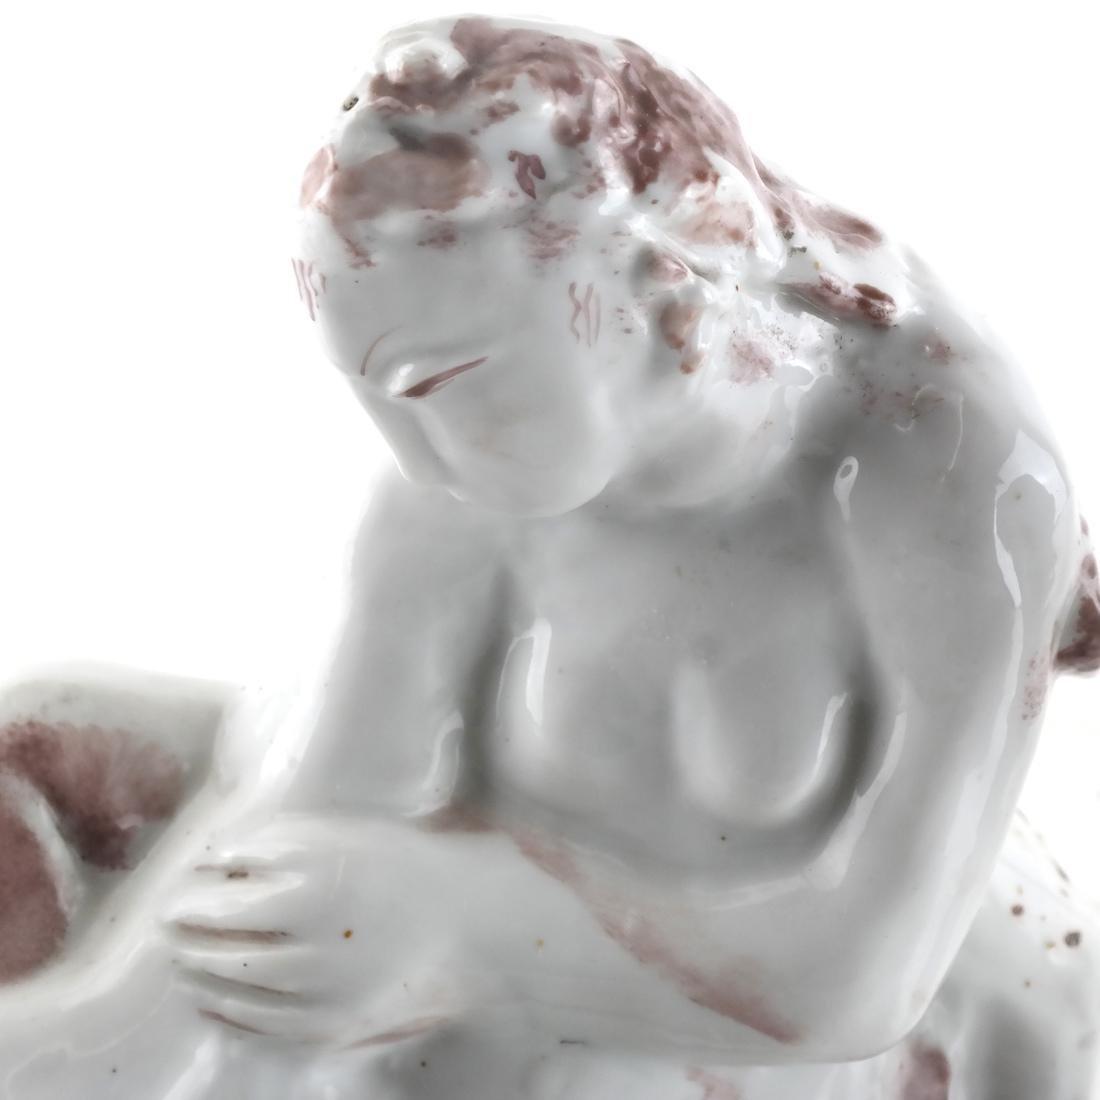 Two Ceramic Sculptures - Cat & Woman - 2